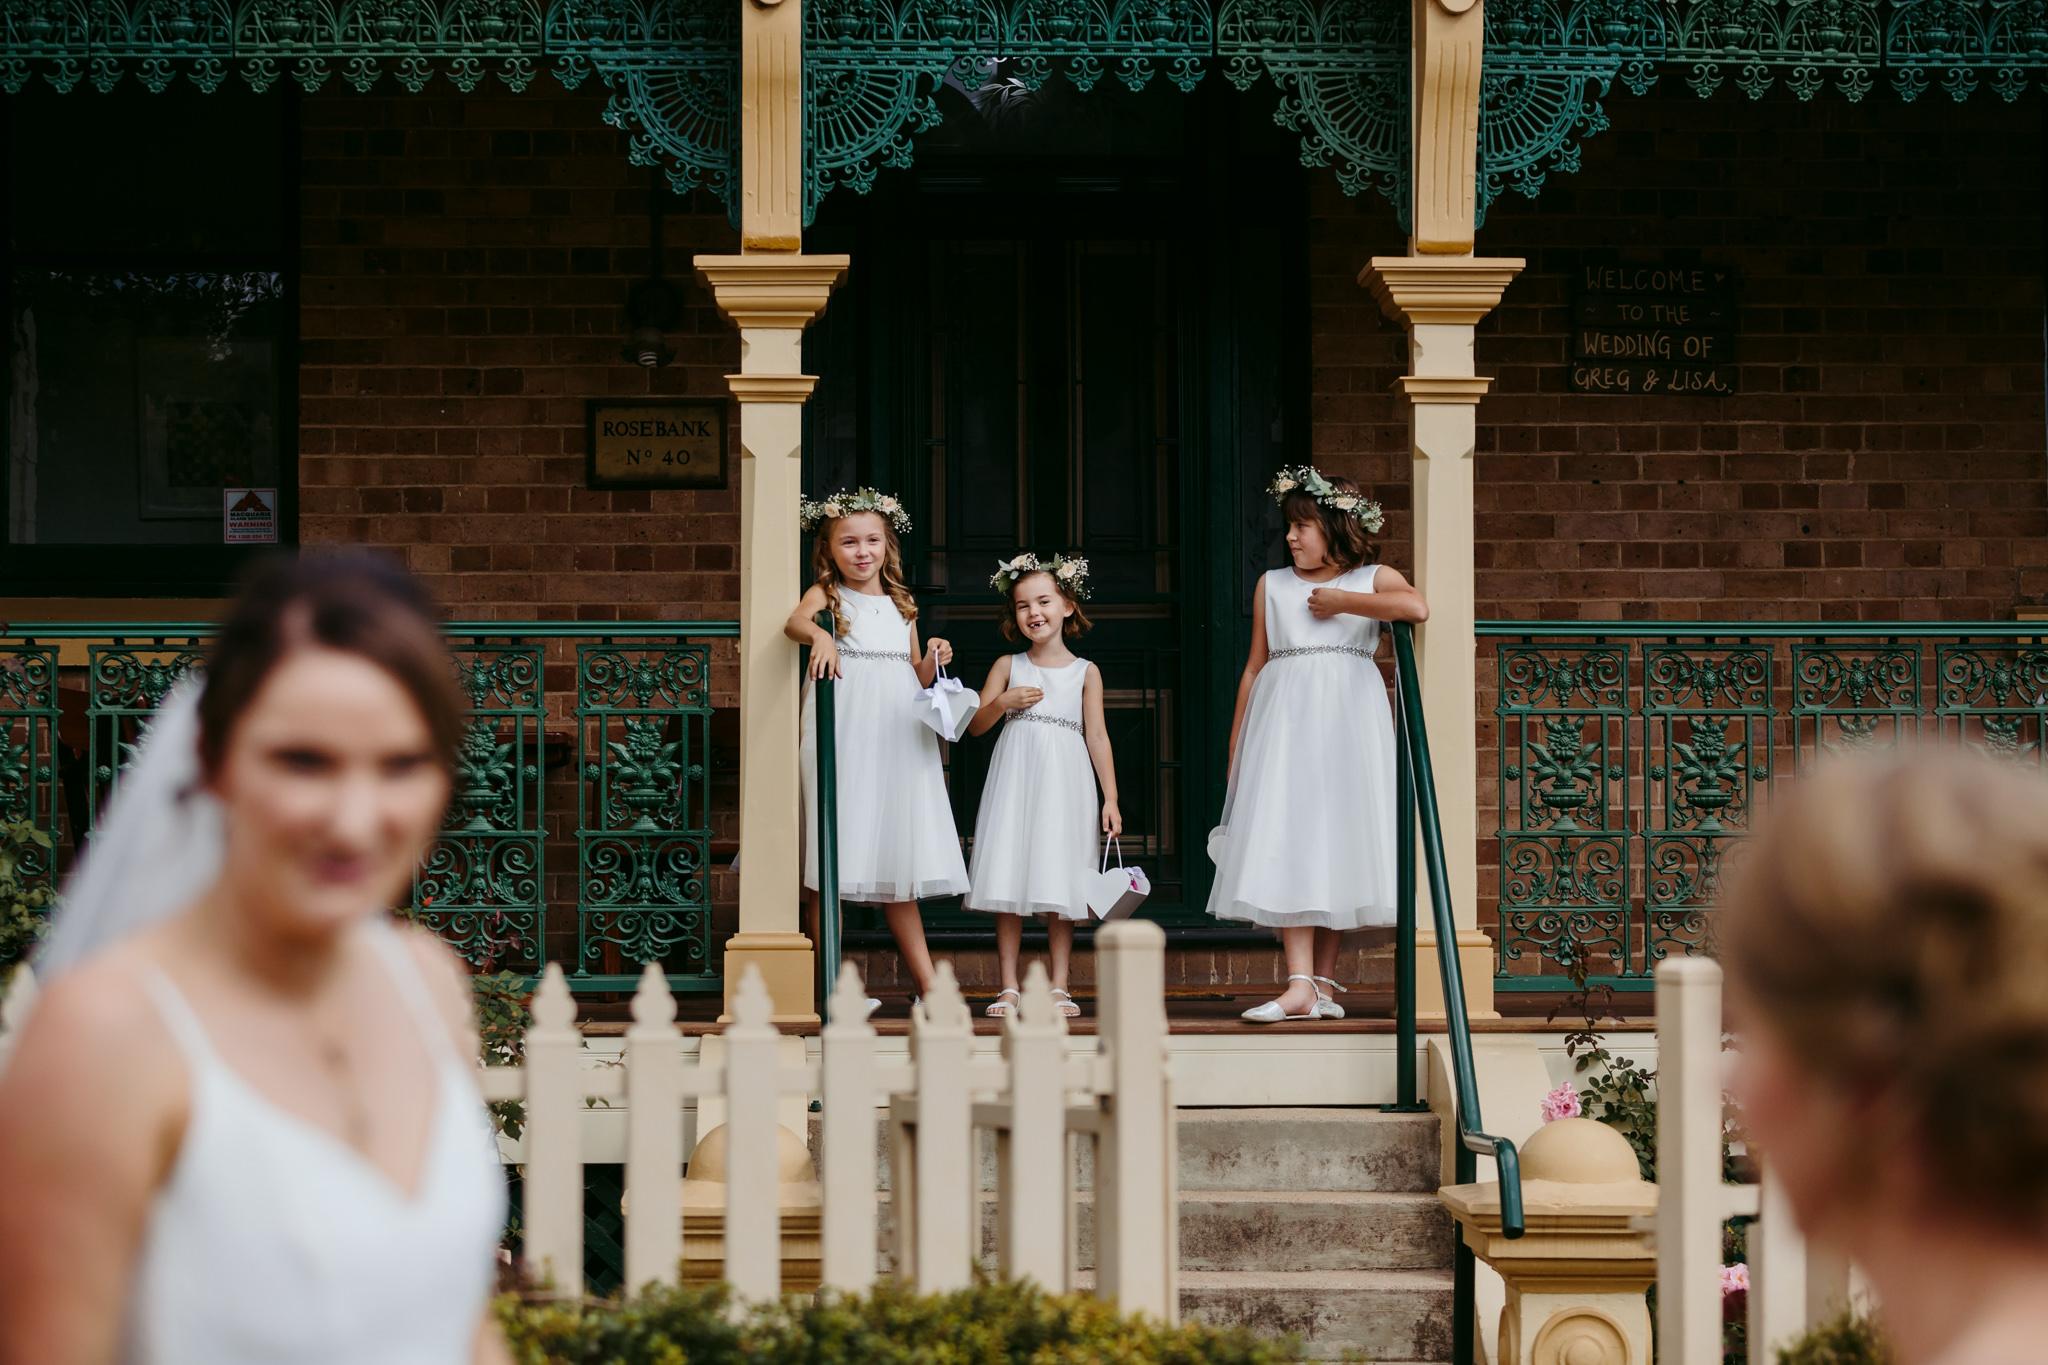 Erin Latimore Mudgee Canberra Wedding Photographer ROSEBANK GUESTHOUSE OLD THEATRE TONIC MILLTHORPE_167.JPG